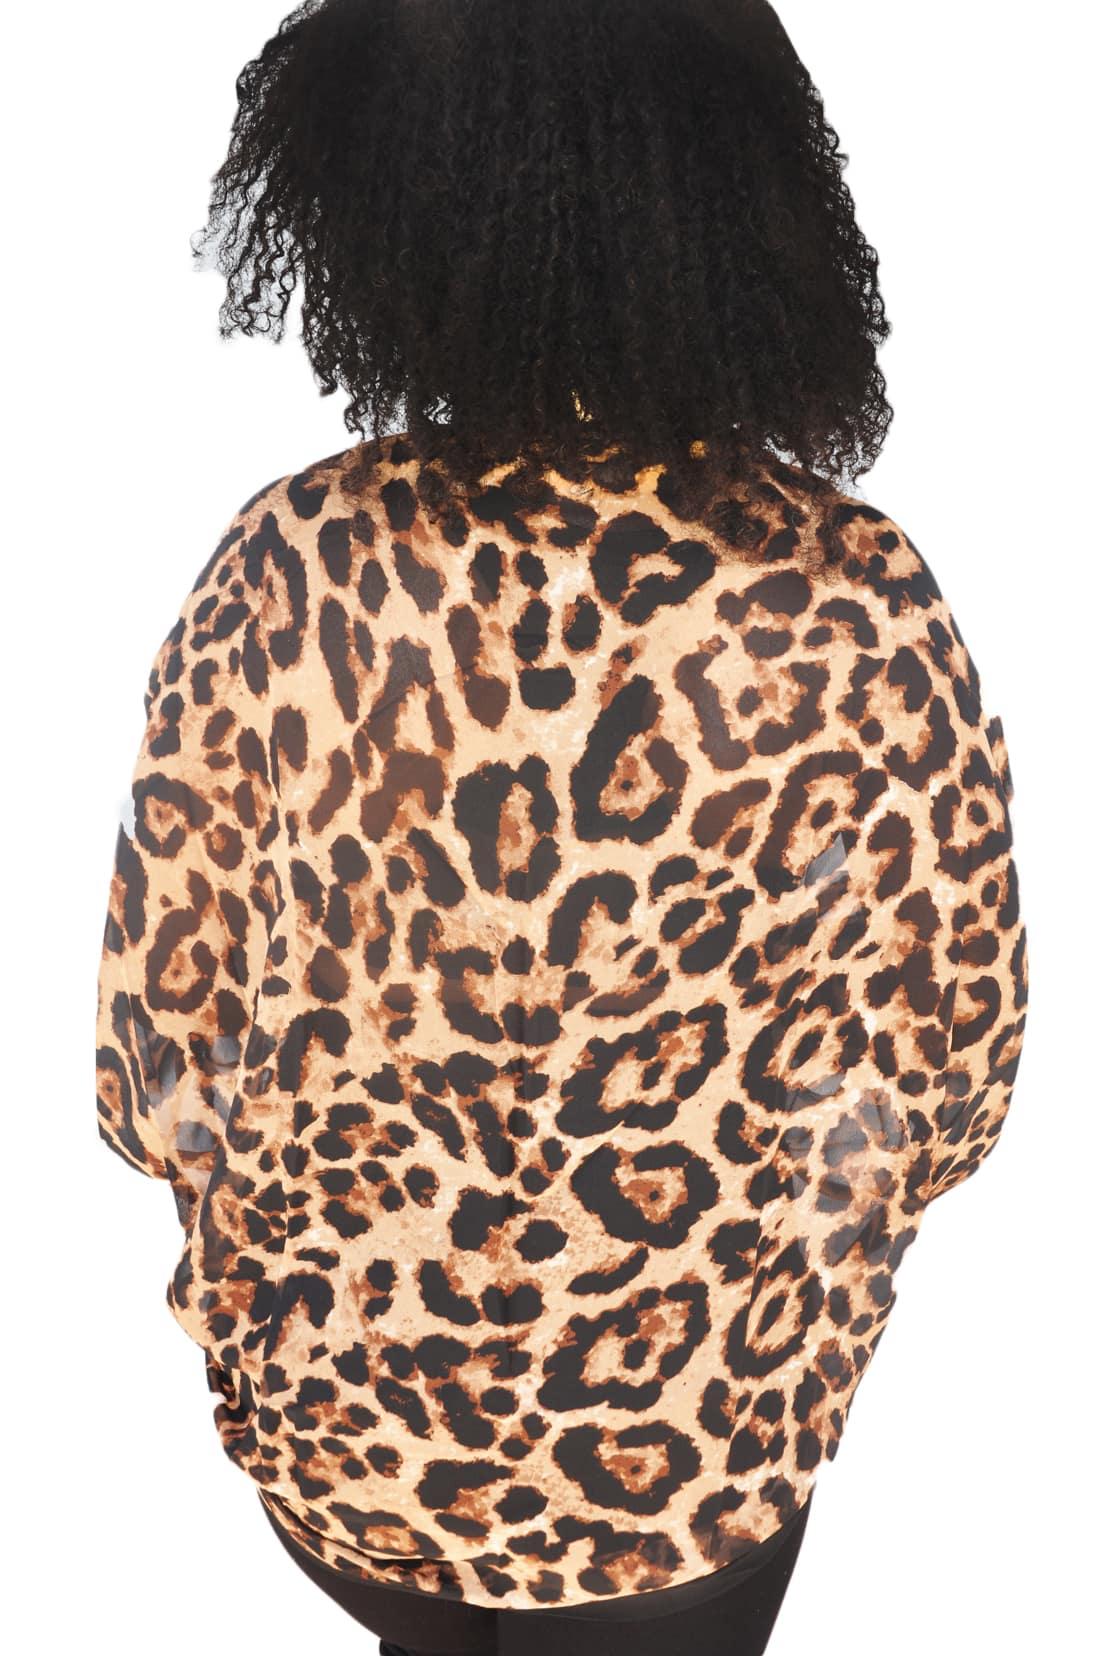 M0162 animalprint3 Tops Shirts maureens.com boutique